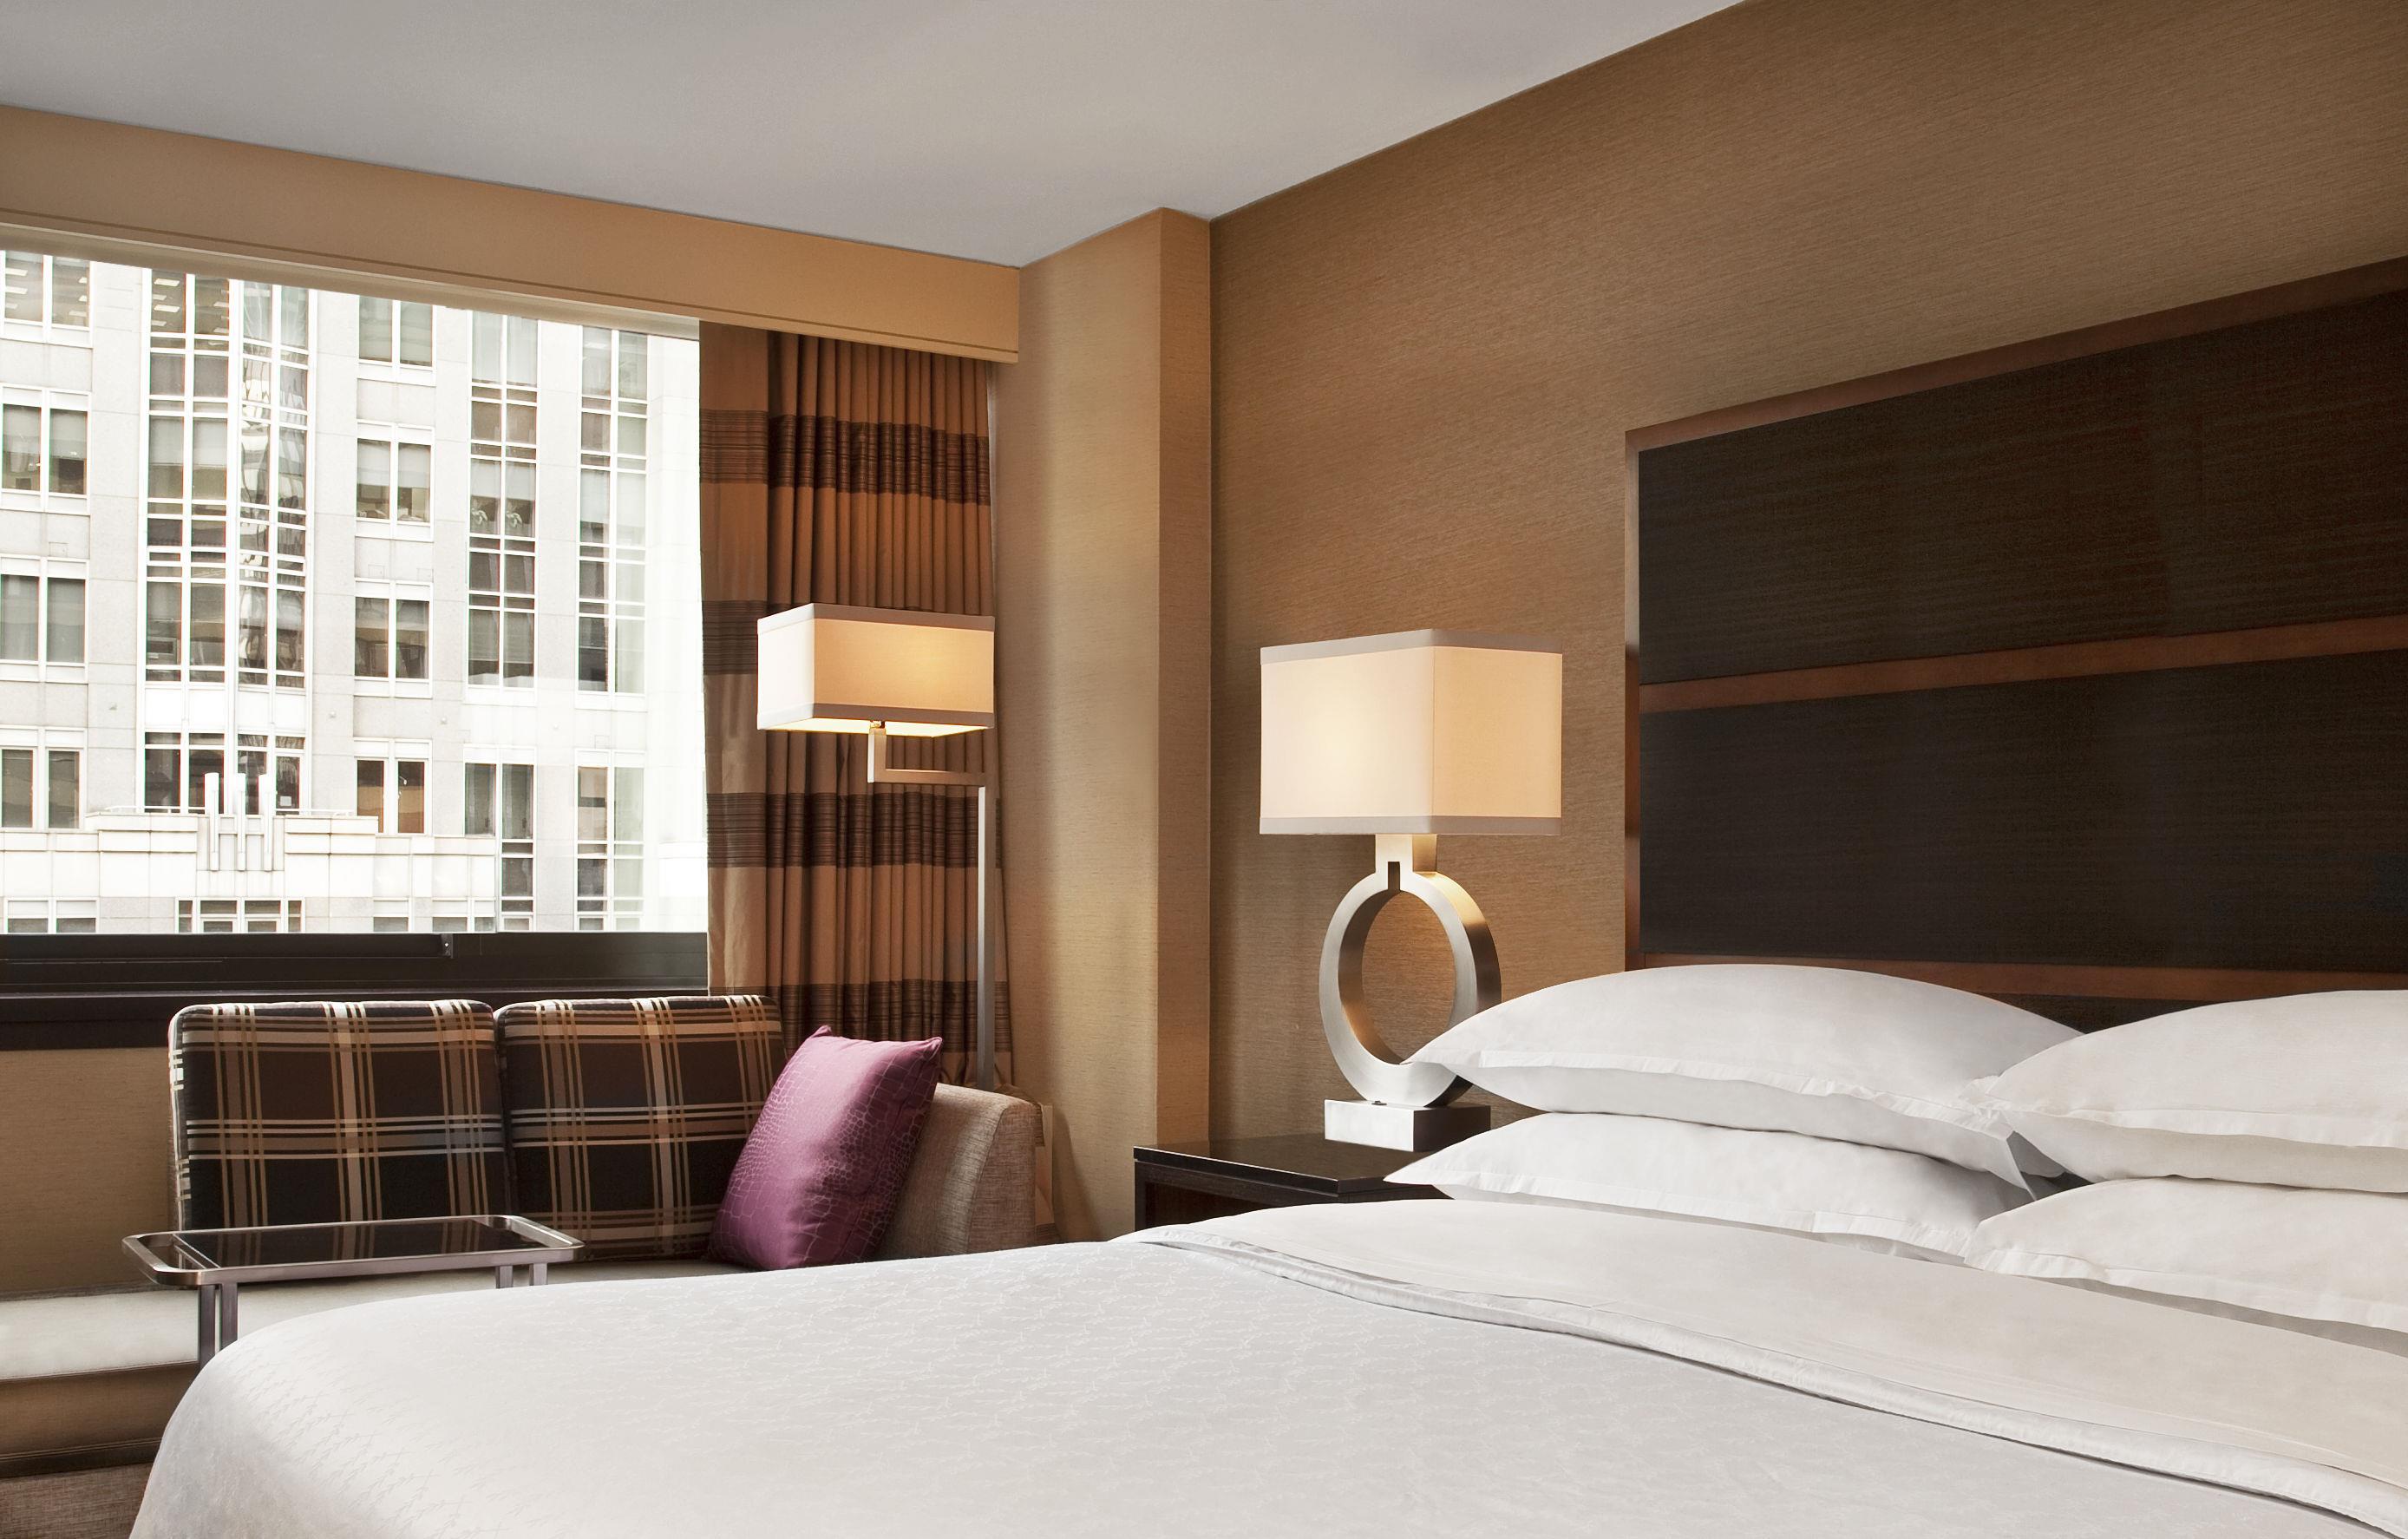 Sheraton New York Times Square Hotel image 15